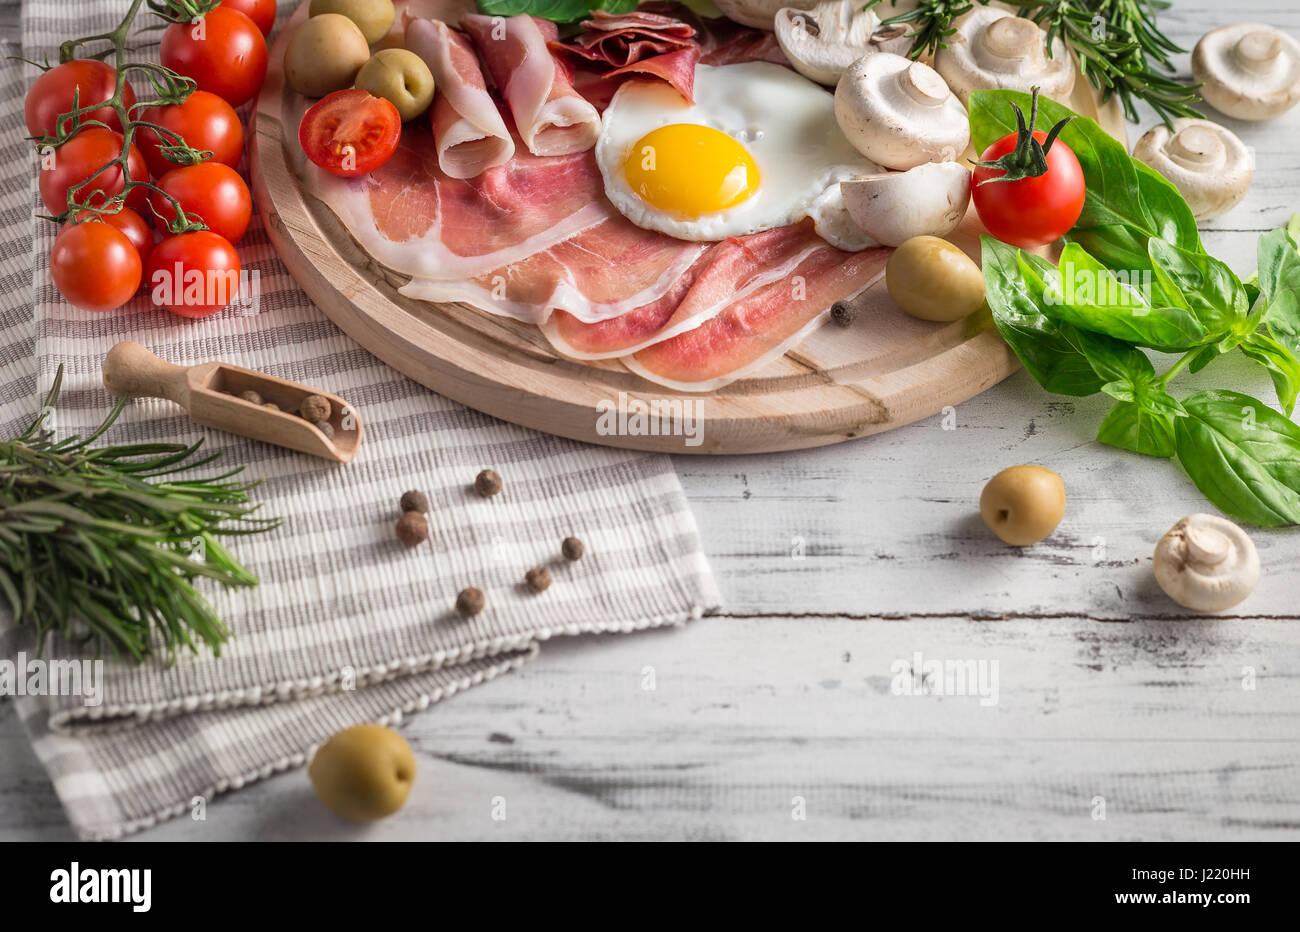 Petit-déjeuner méditerranéen sain d'épicerie: œufs frits, jambon, champignons, tomates, Photo Stock